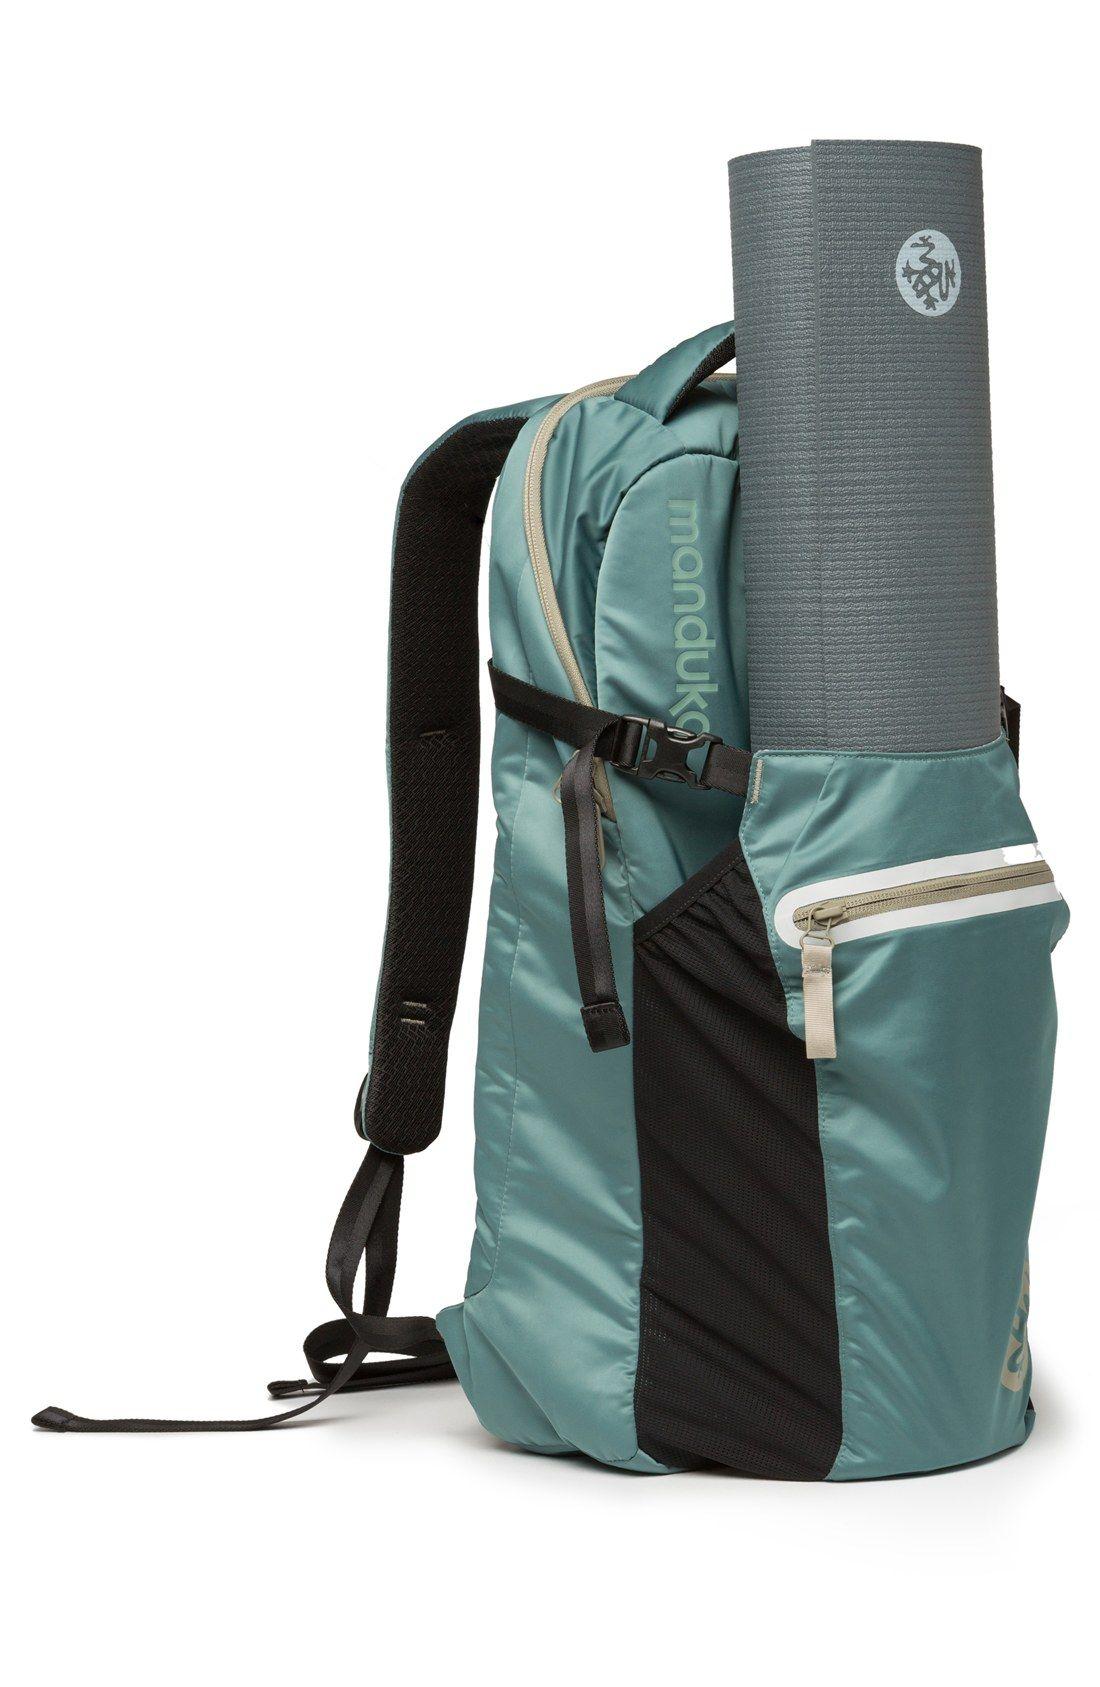 Reliable Yoga Mat Bag Waterproof Yoga Mat Bag Mesh Backpack Shoulder Messenger For Women Gym Bag Black Yoga Circle Men's Shoes